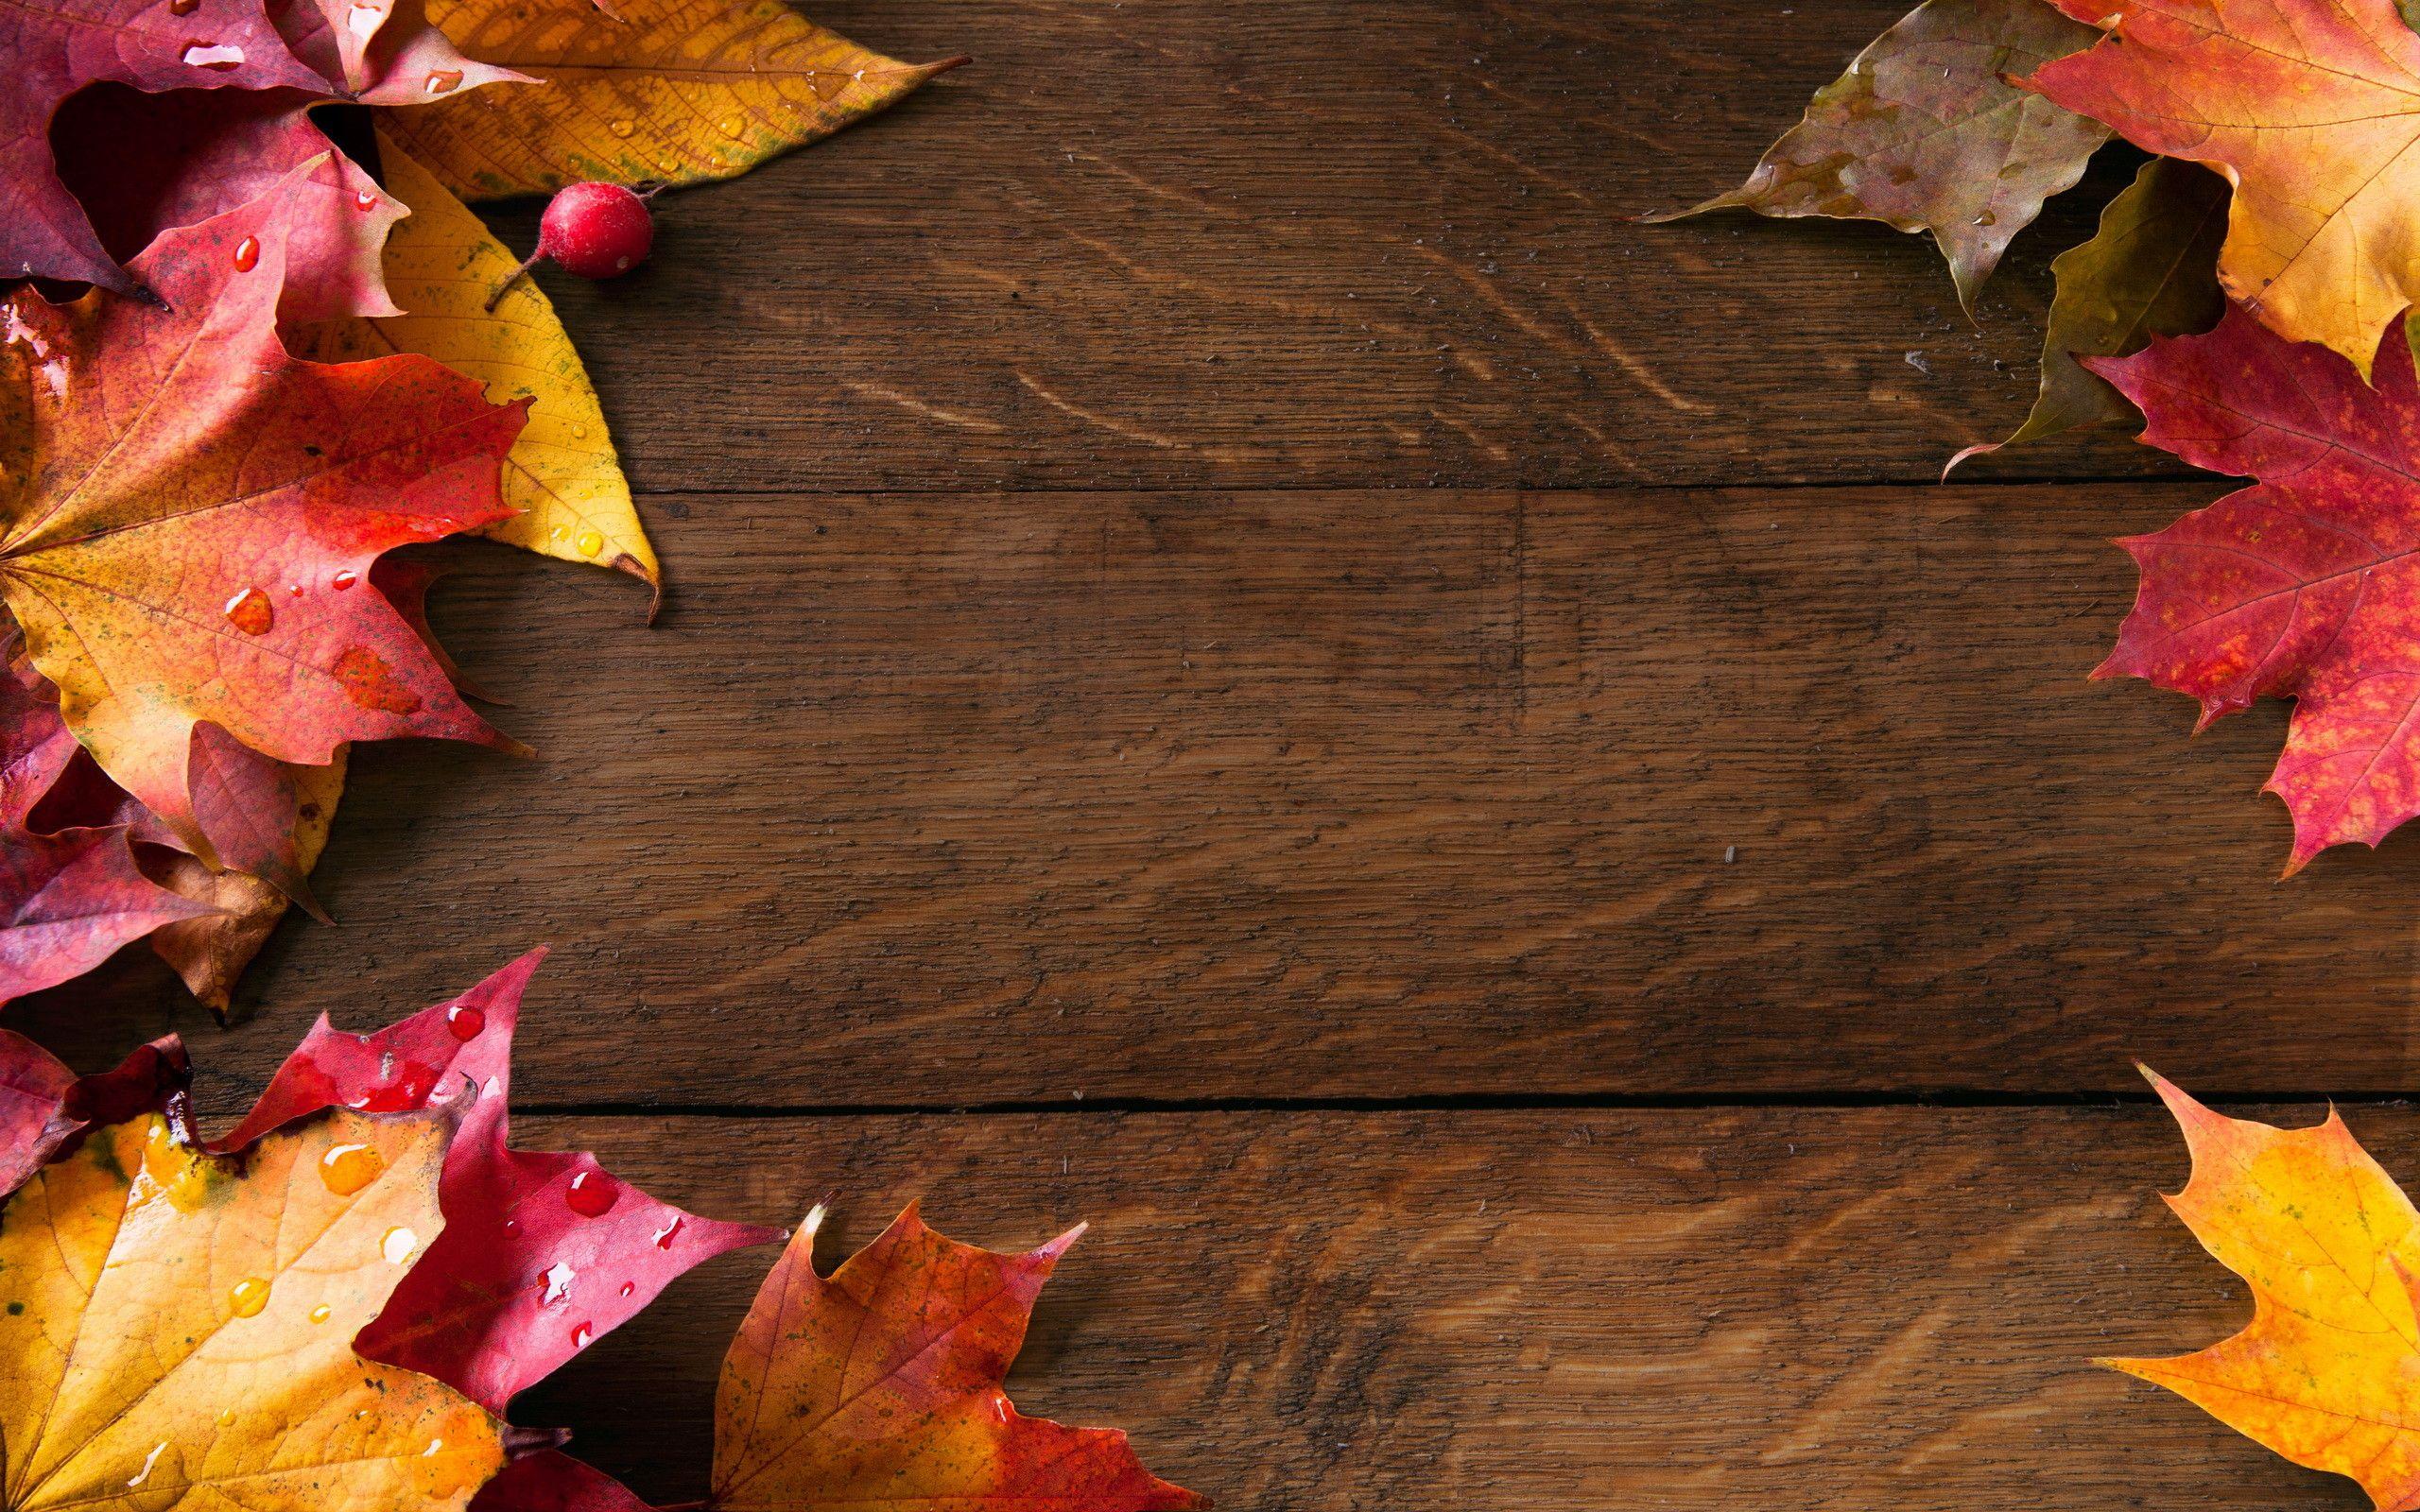 Fall Desktop Wallpapers 1080p On Wallpaper 1080p Hd Desktop Wallpaper Art Fall Wallpaper Autumn Wallpaper Hd